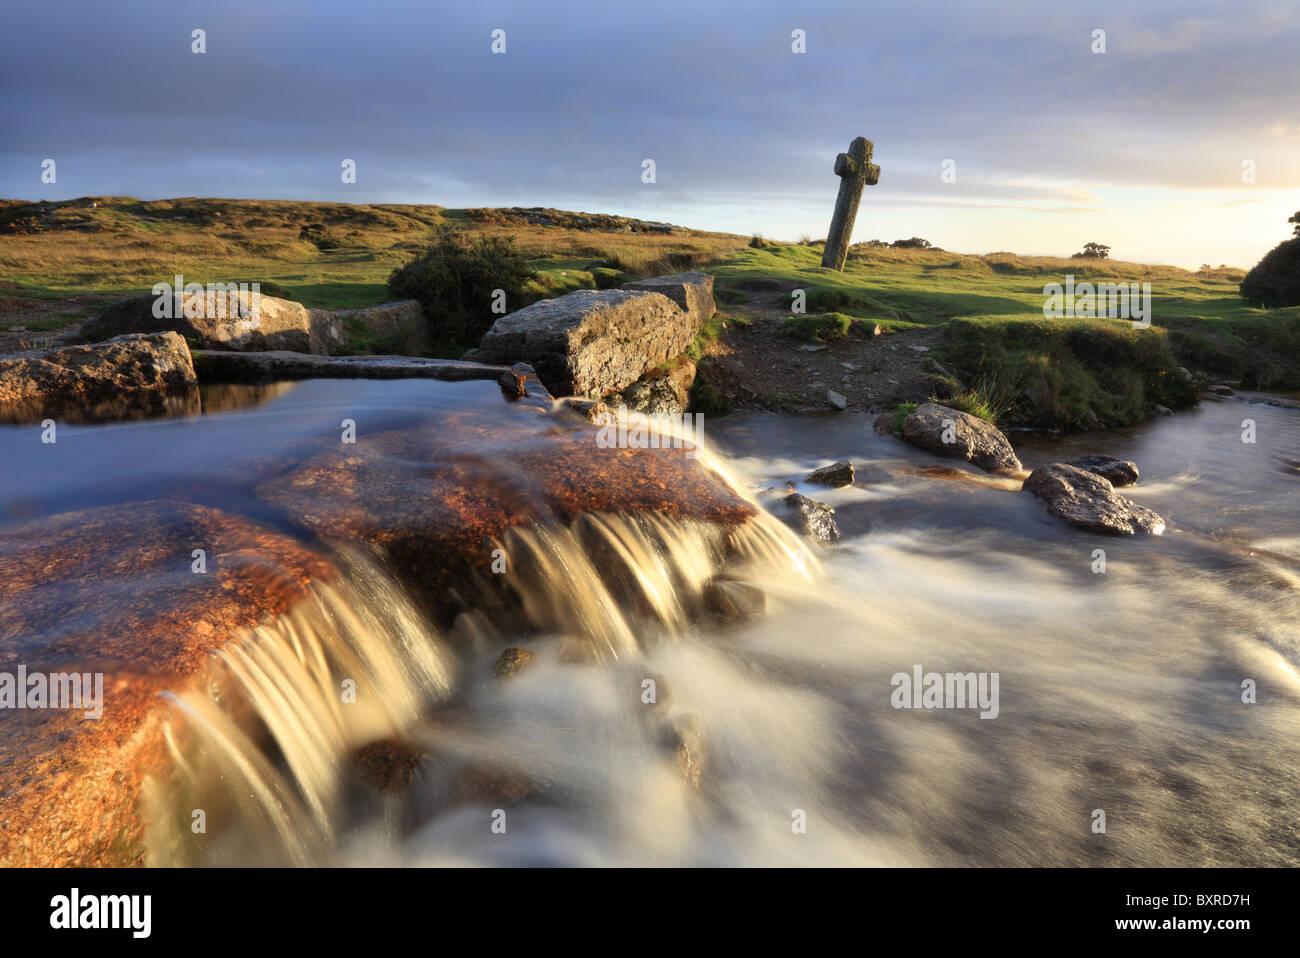 Windy Post Celtic Cross on Dartmoor captured in late evening light - Stock Image